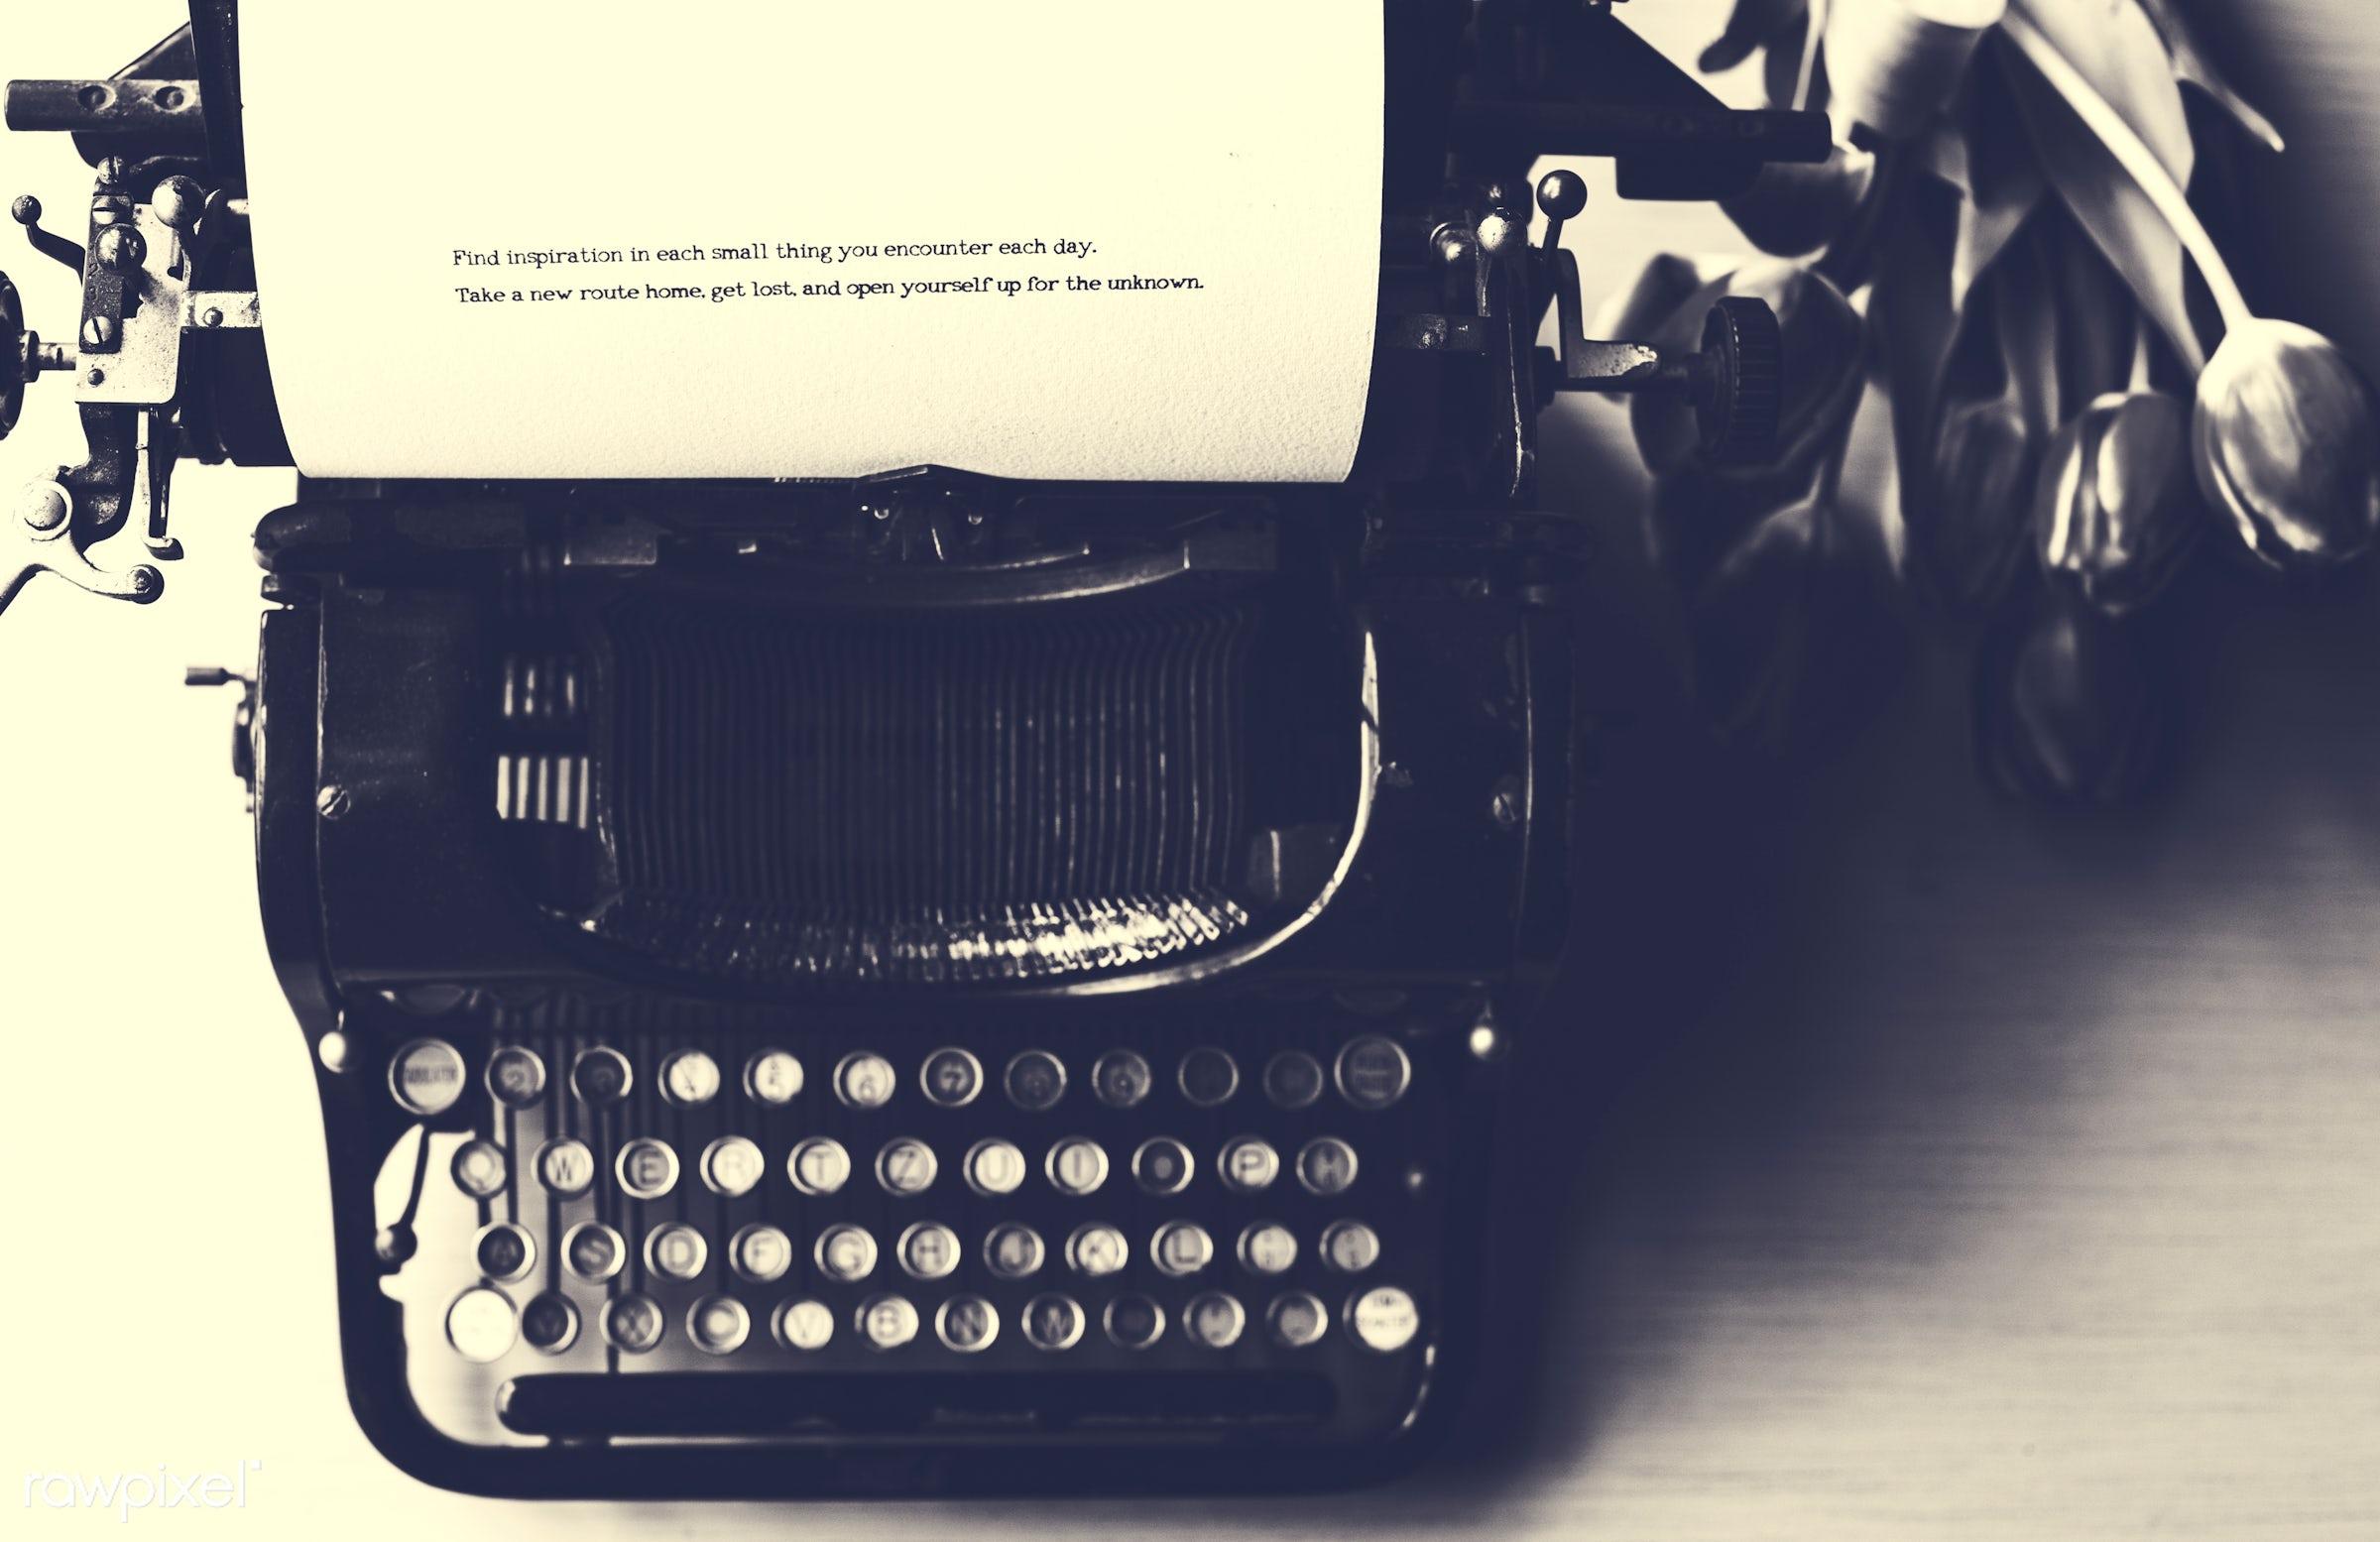 journalism, paper, typescript, retro, desk, type, reporter, author, document, typewriter, write, report, publish, writer,...